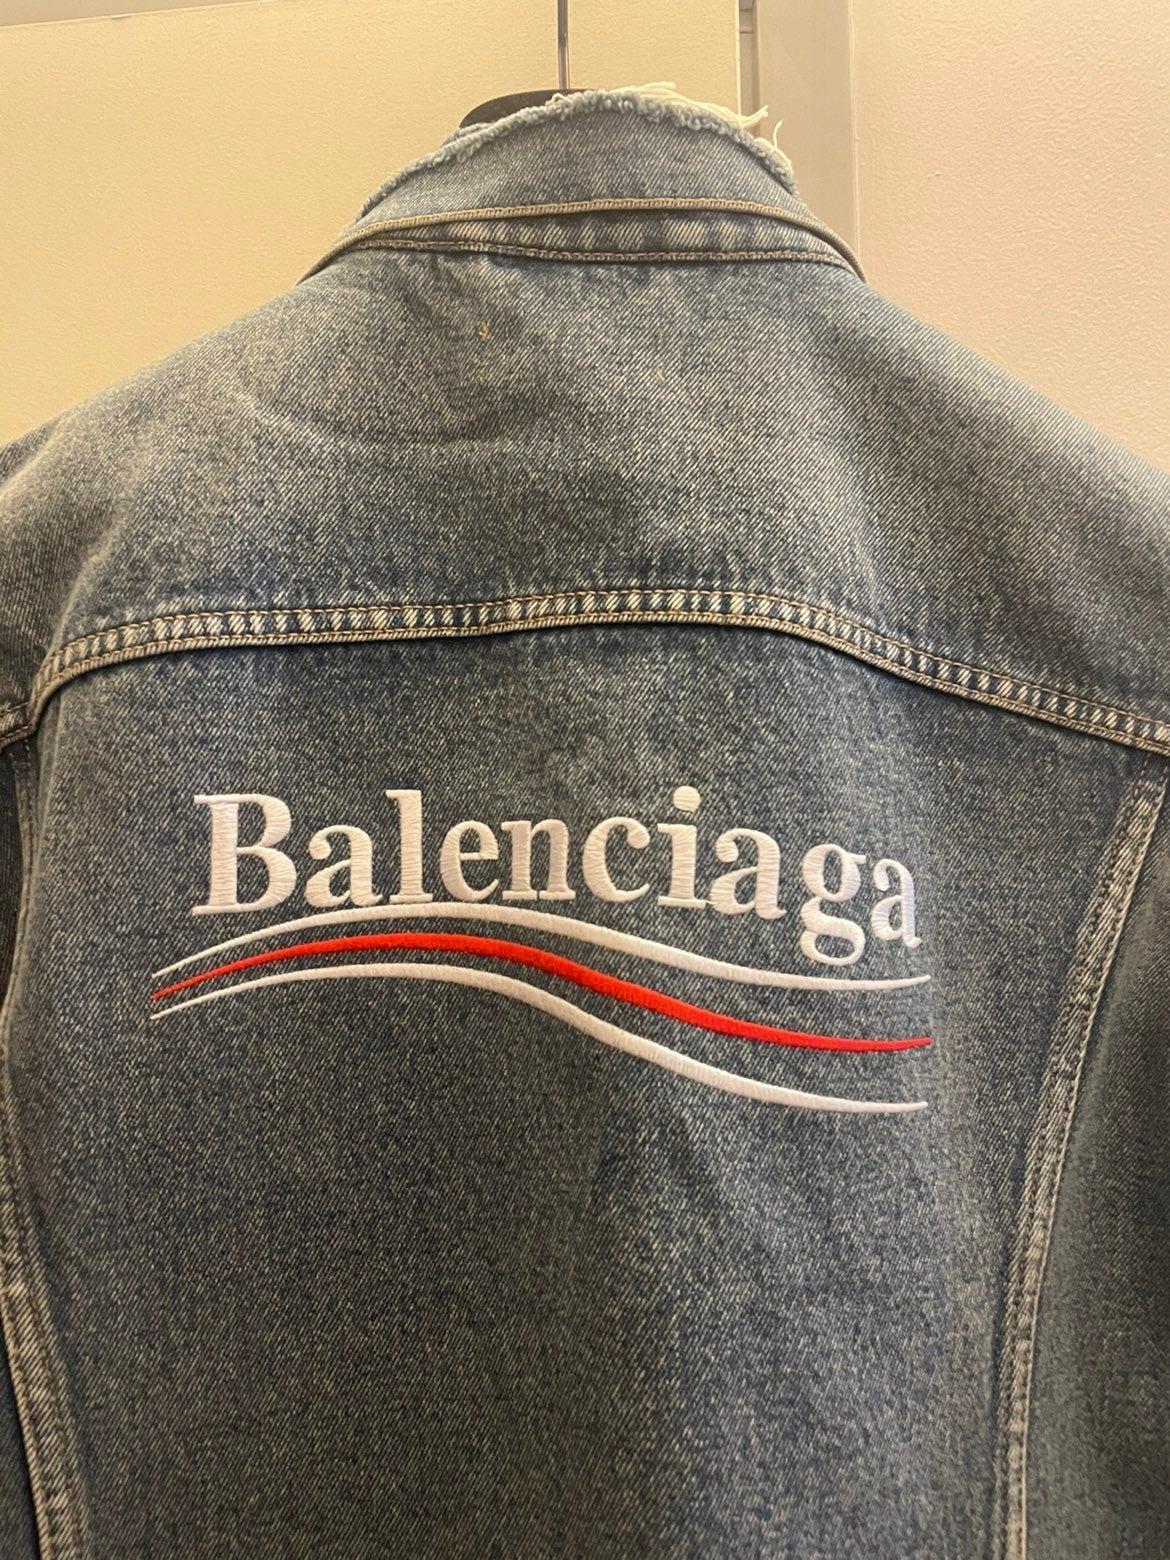 Balenciaga Campaign Denim Jacket Size 50